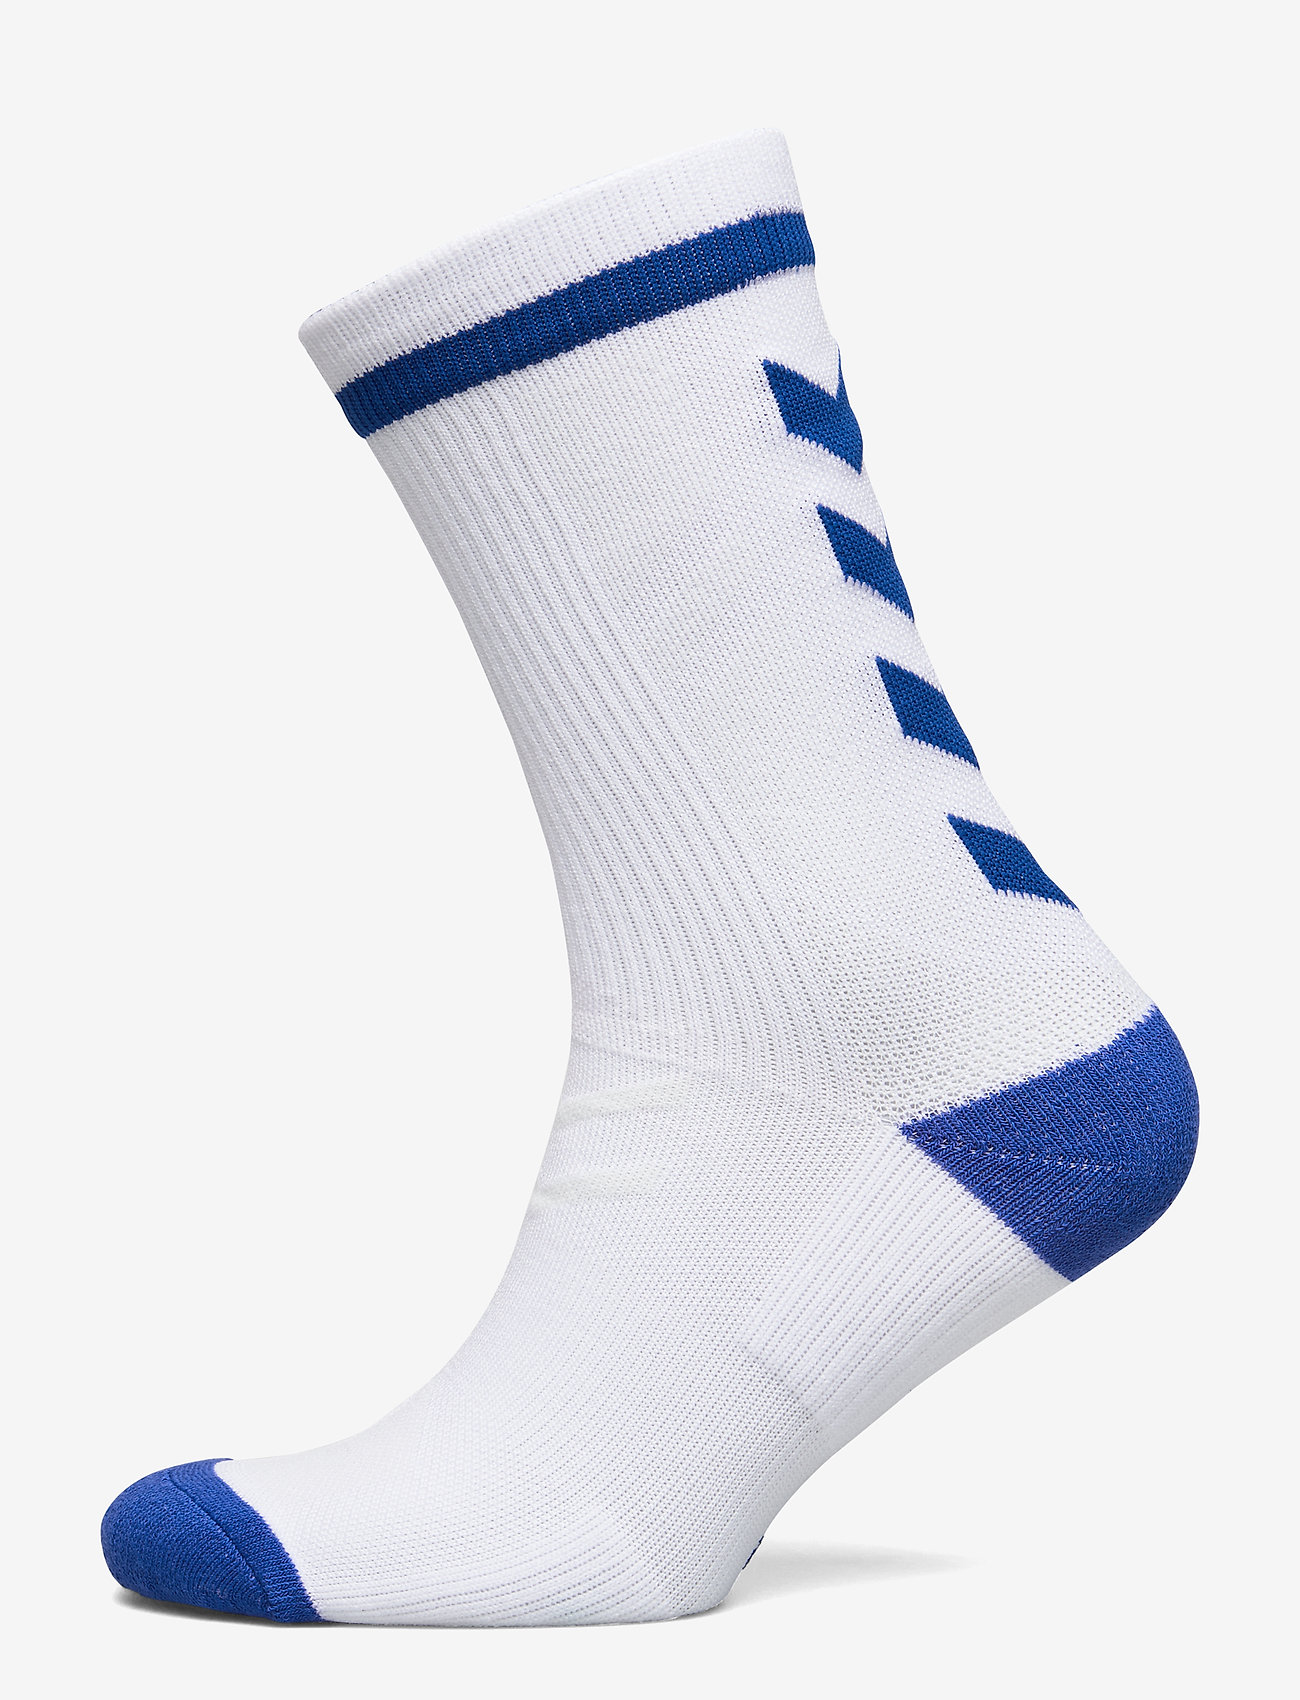 Hummel - ELITE INDOOR SOCK LOW - football socks - white/true blue - 0